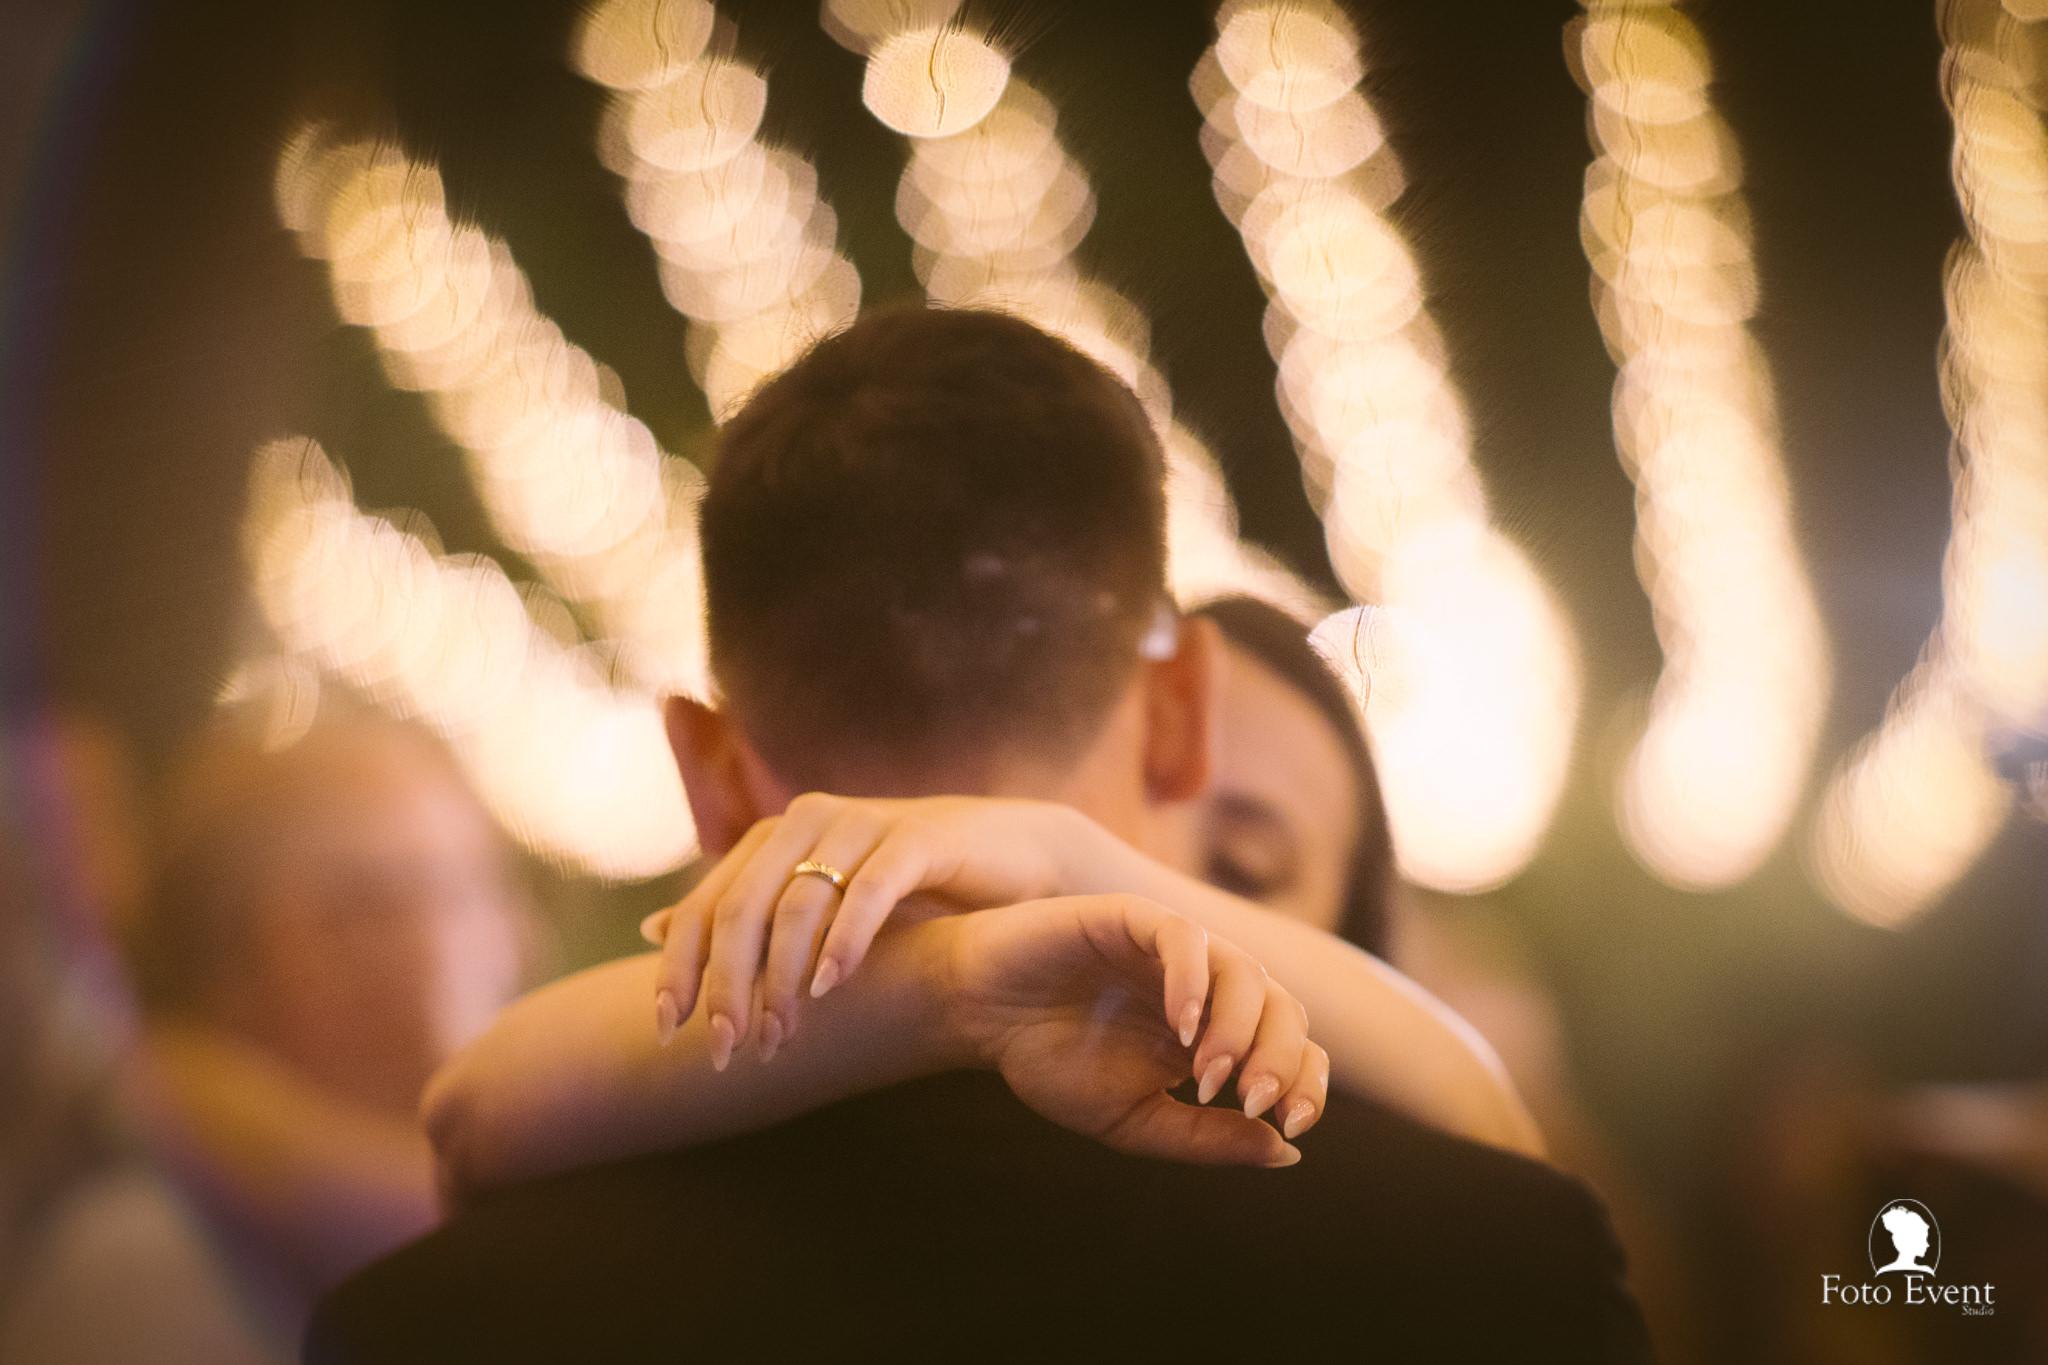 064-2019-08-22-Matrimonio-Angela-e-Nicola-Iaconis-Ric2-844